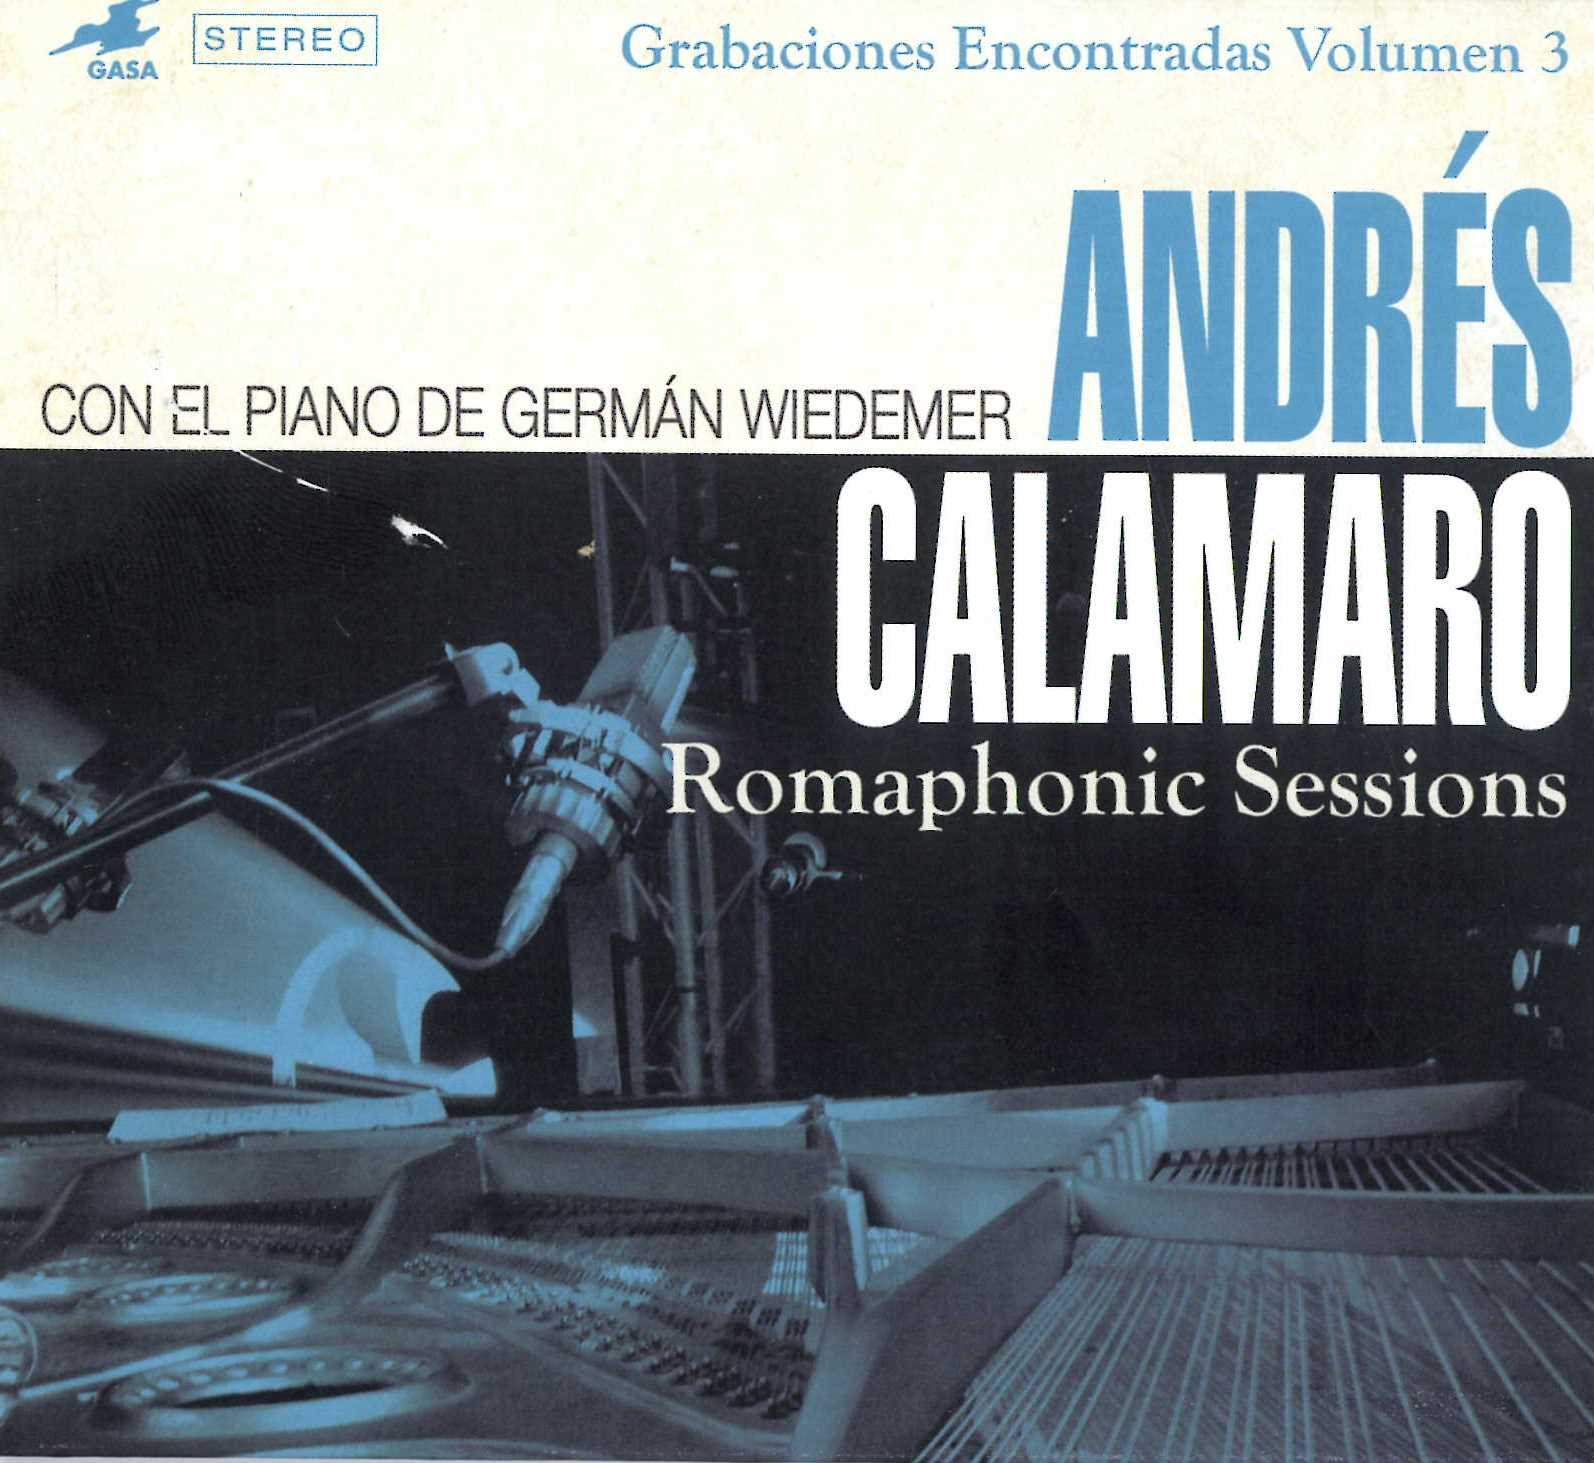 Grabaciones encontradas Vol. 3: Romaphonic sessions